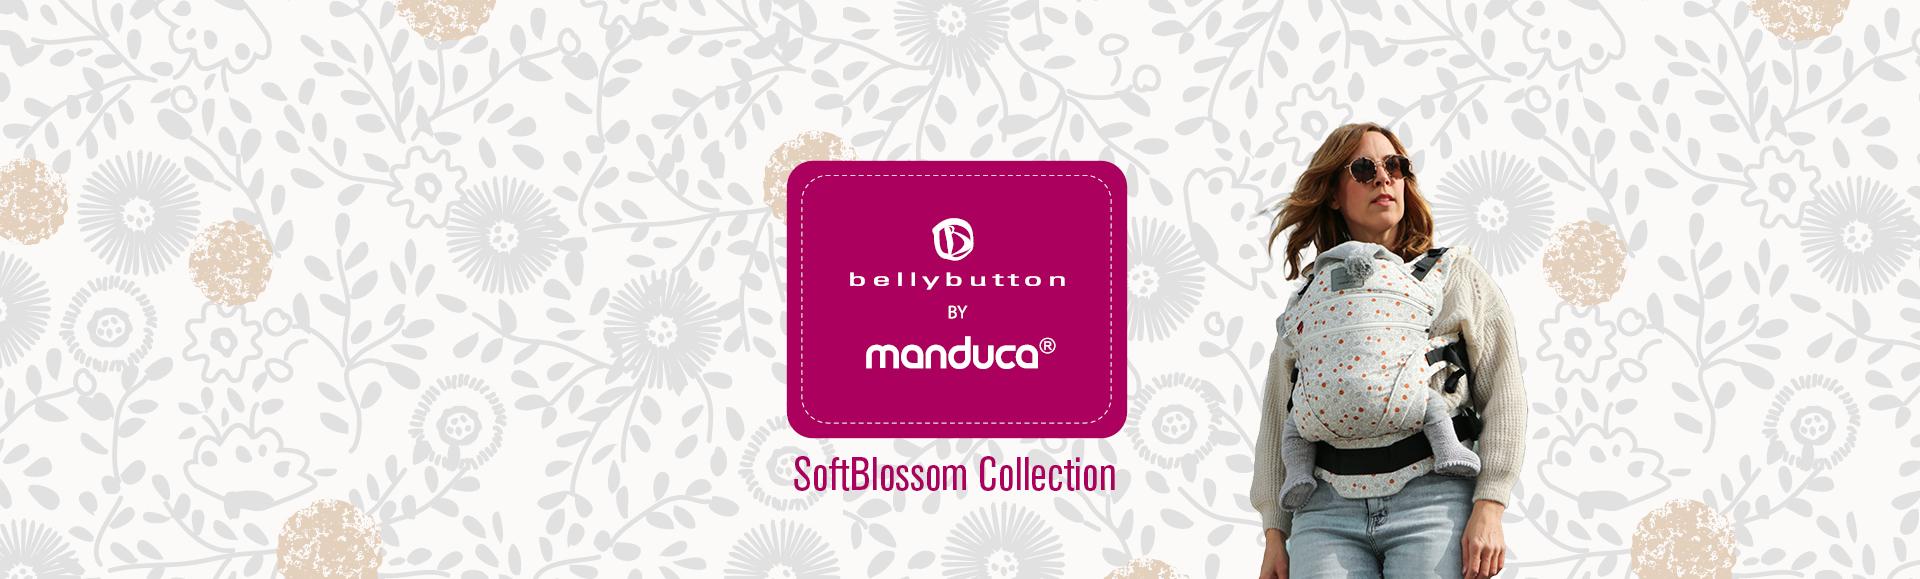 bellybutton softblossom